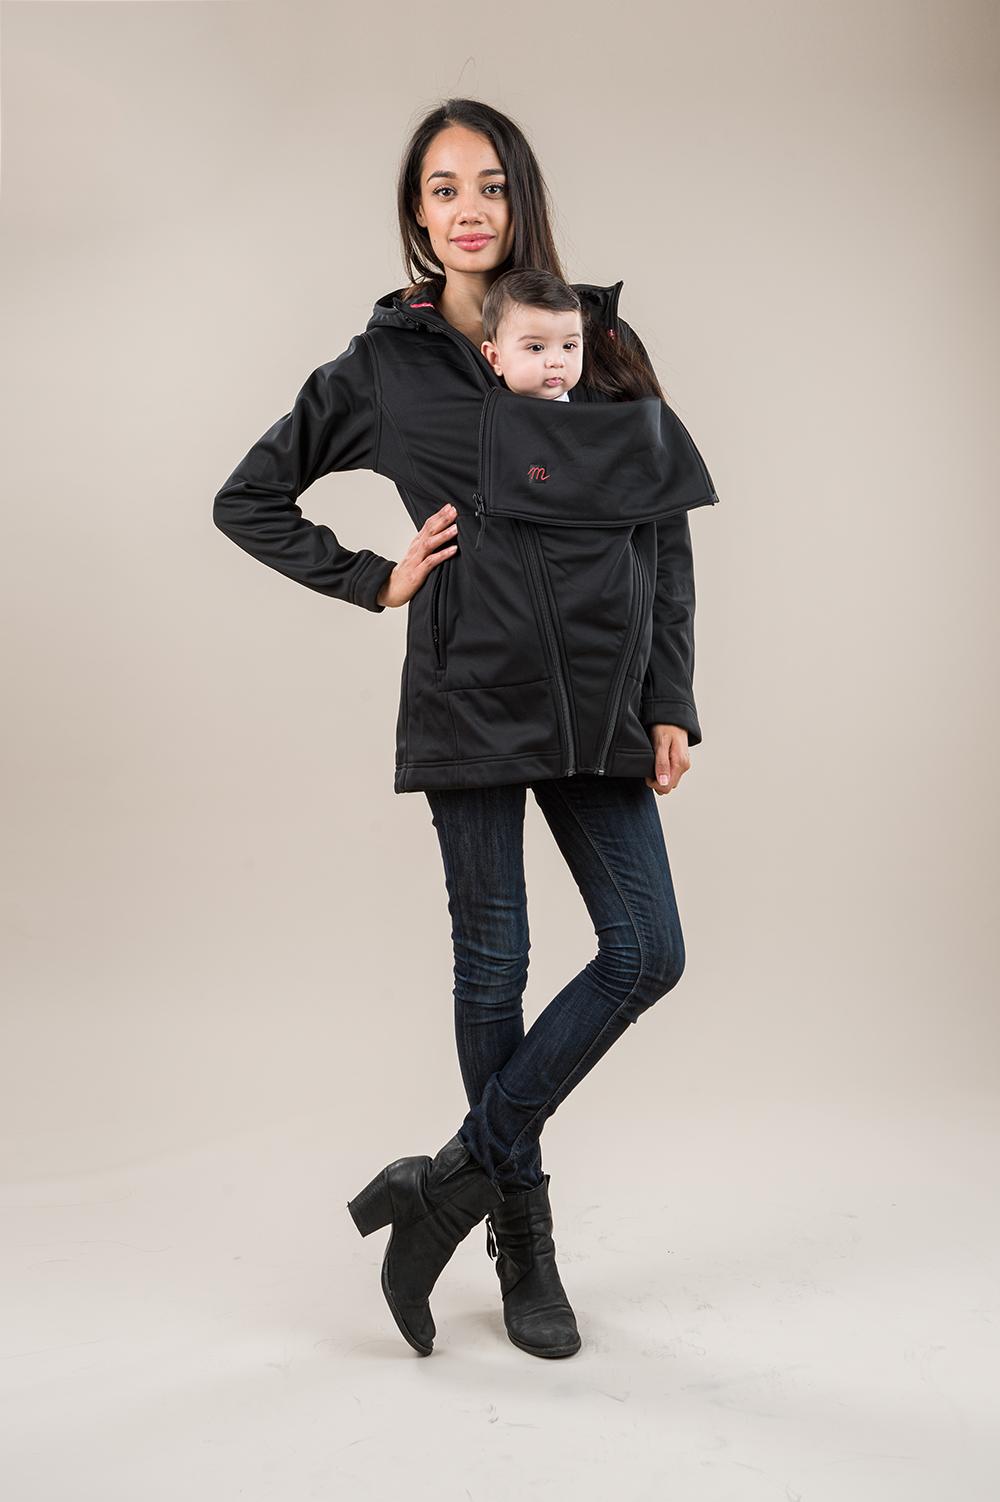 Nighty Night Black M Shell Light Jacket Maternity Coat How To Wear